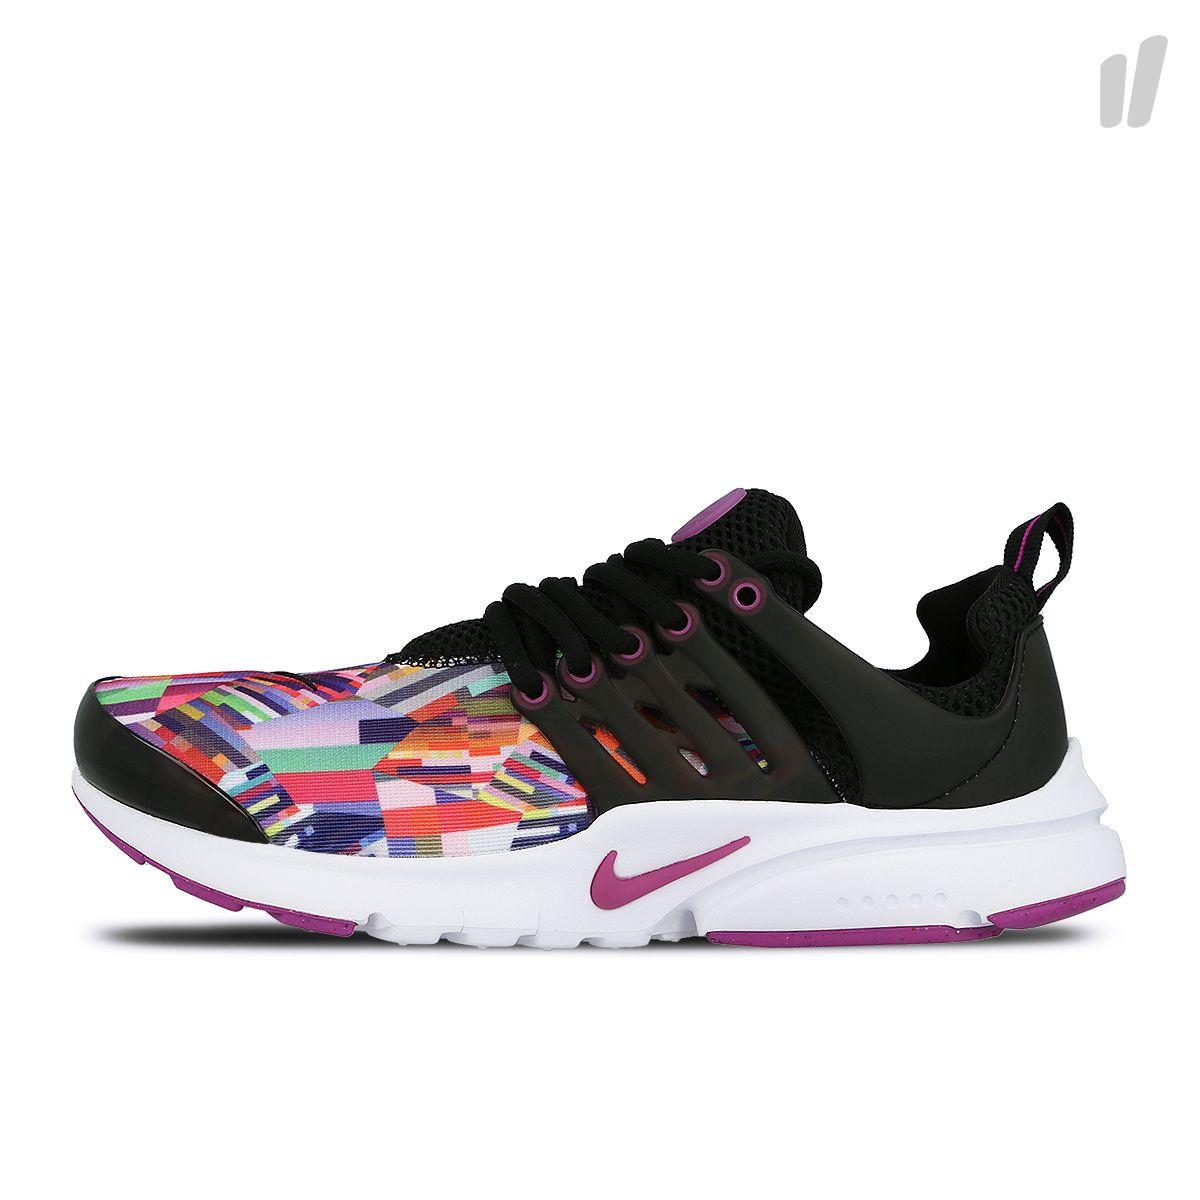 b976e3c9191b Nike Presto Print GS ( 859599 001 )  lpu  sneaker  sneakers ...